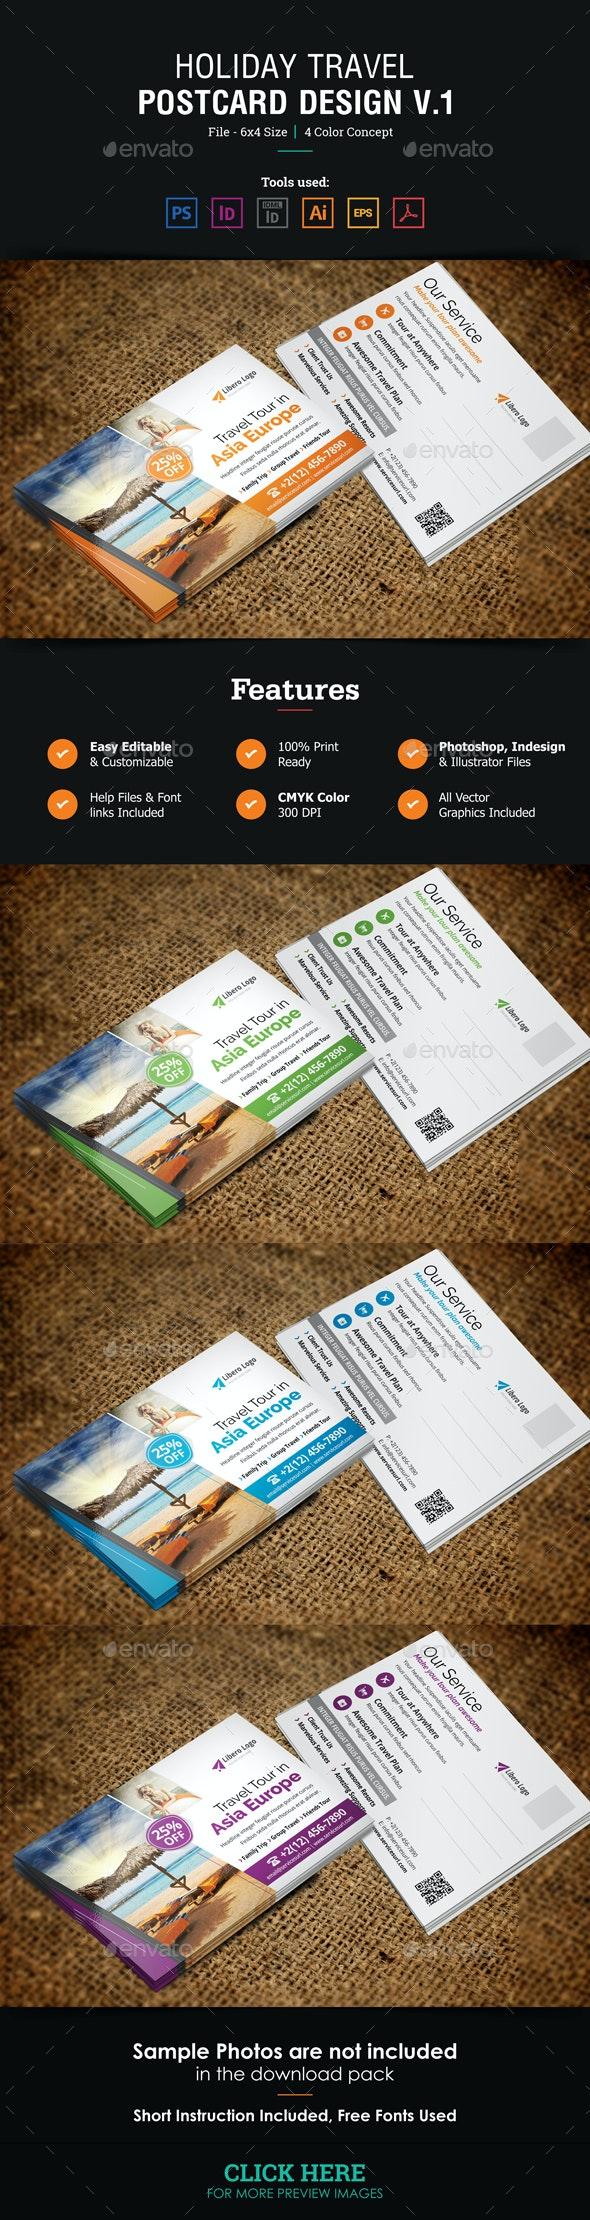 Holiday Travel Postcard Design v1 - Cards & Invites Print Templates